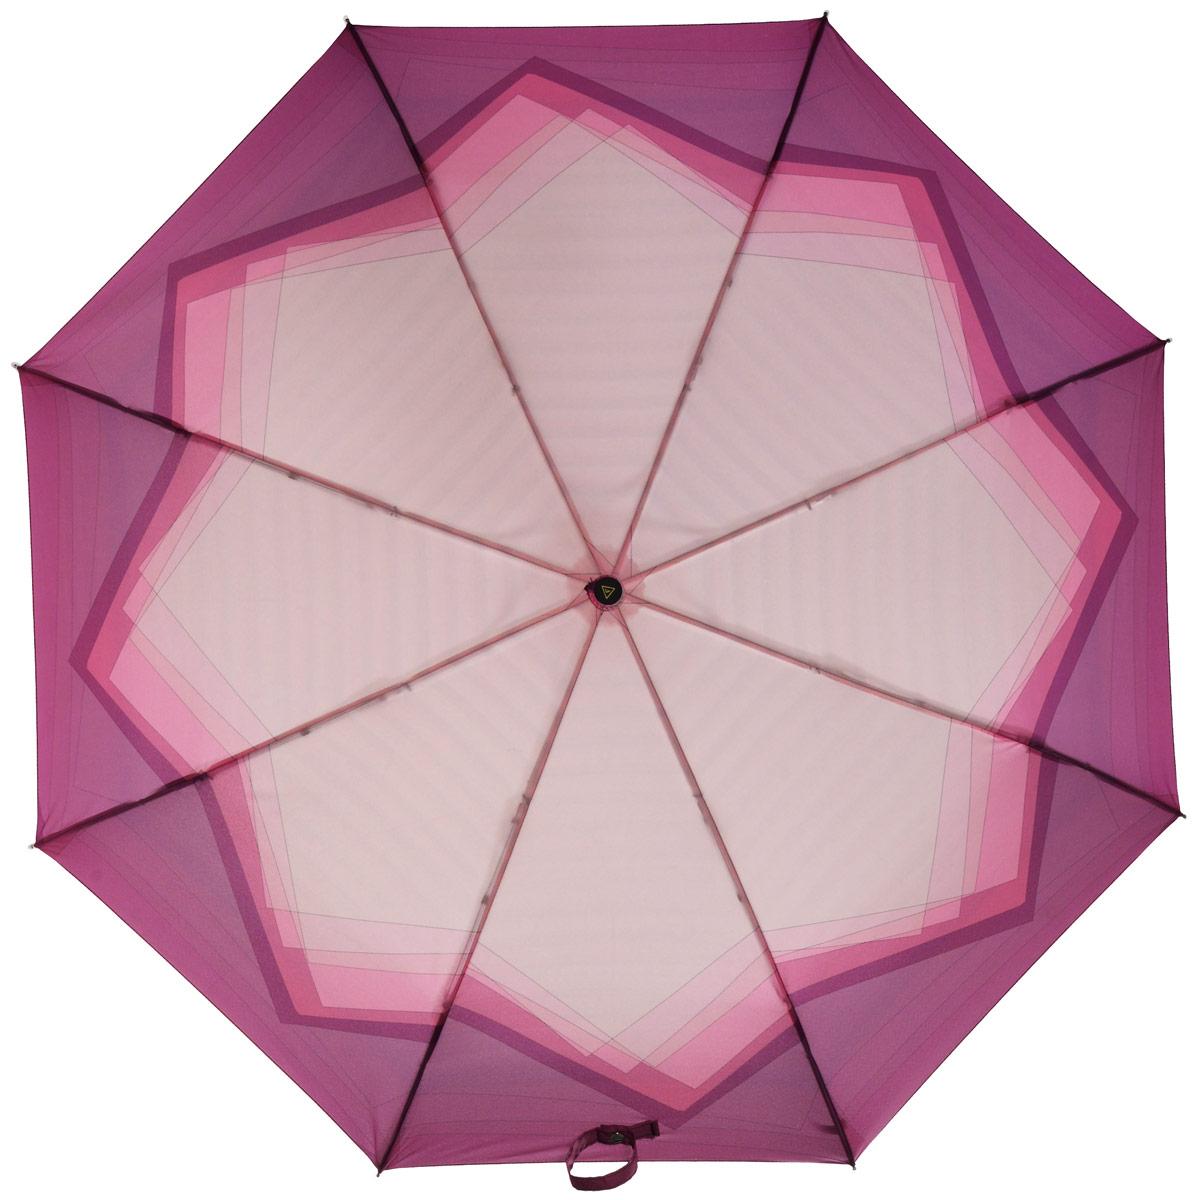 Зонт женский Fabretti, автомат, 3 сложения, цвет: мультиколор. L-16102-7L-16102-7Зонт женский Fabretti, облегченный суперавтомат, 3 сложения